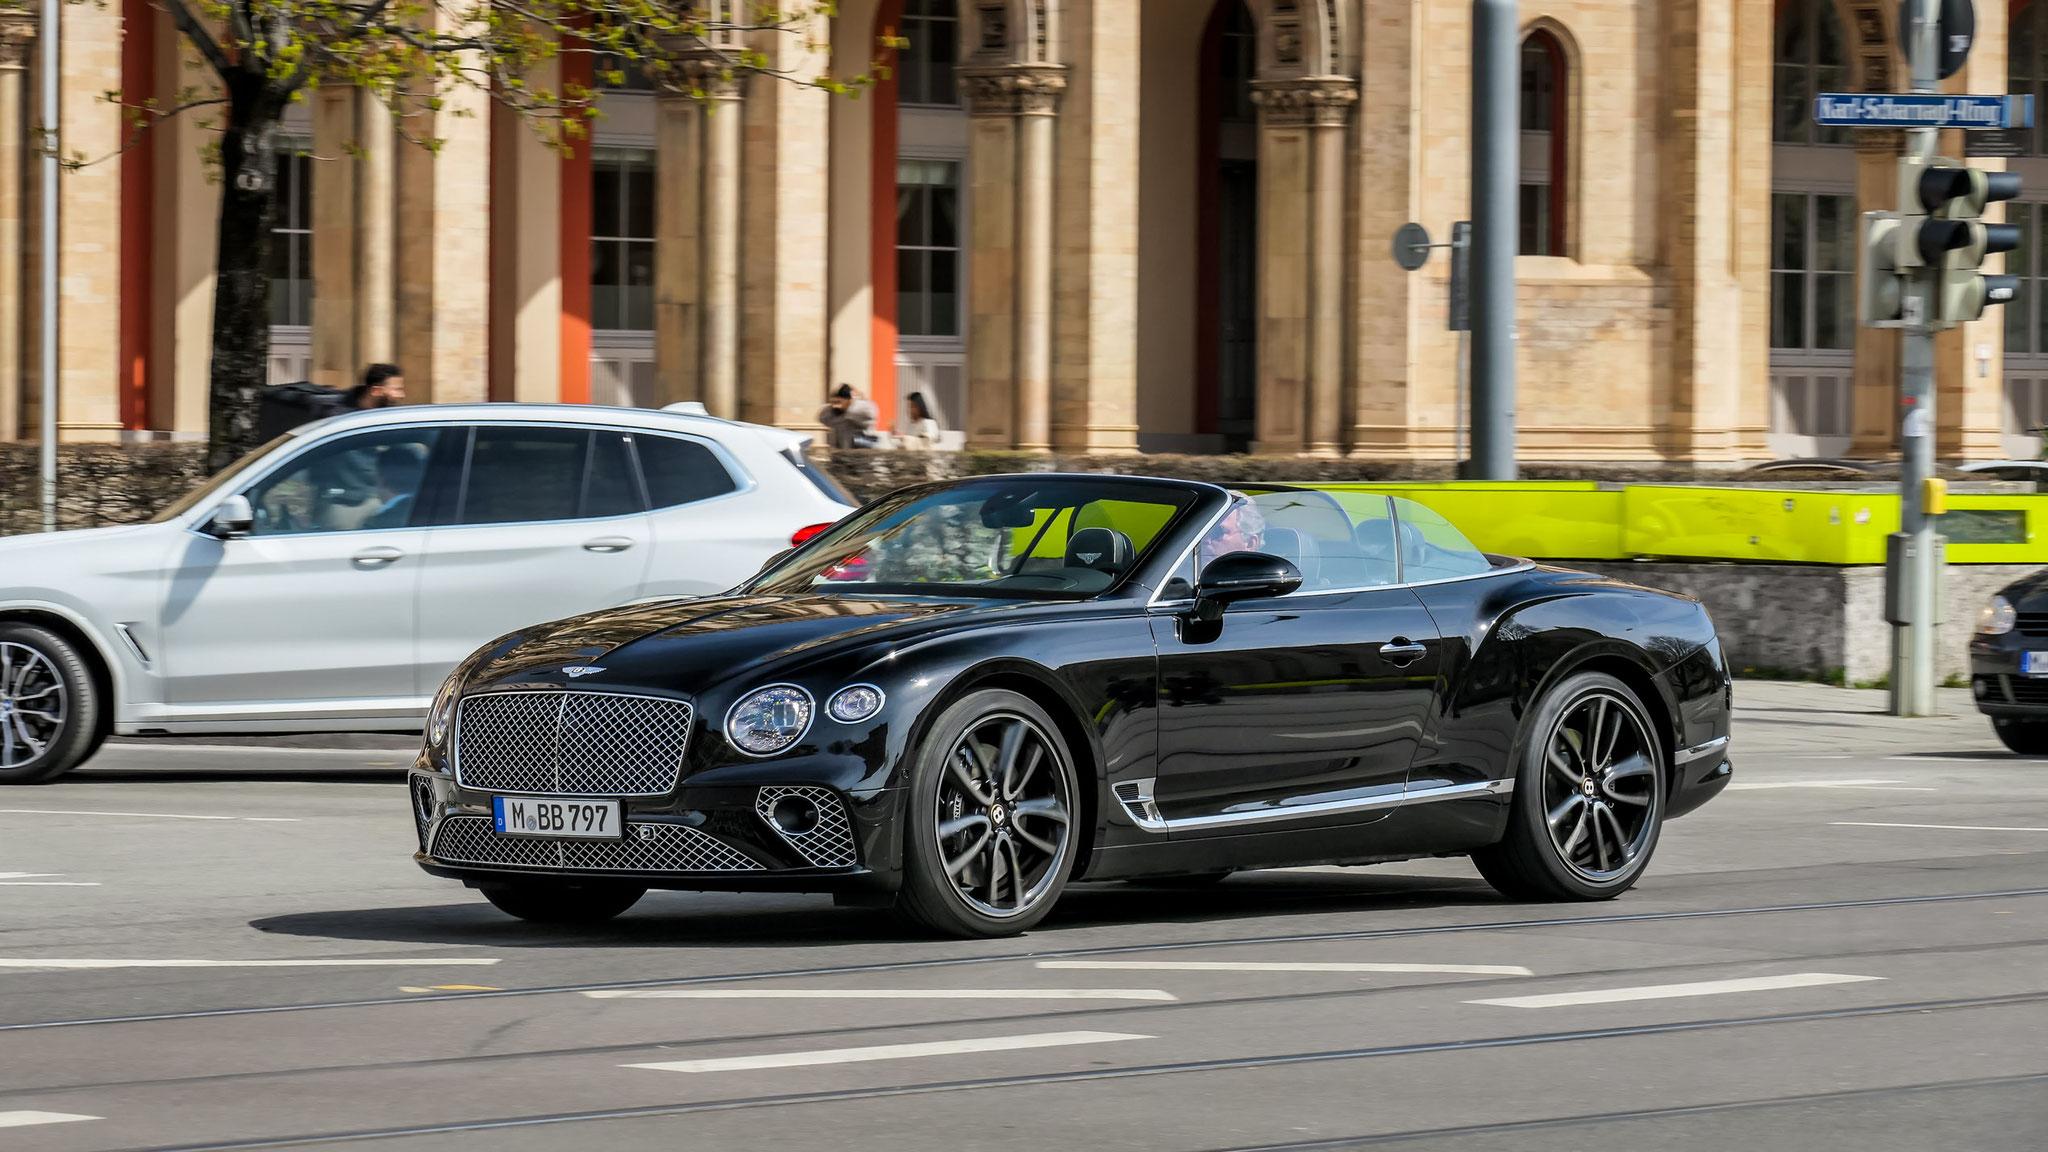 Bentley Continental GTC - M-BB-797